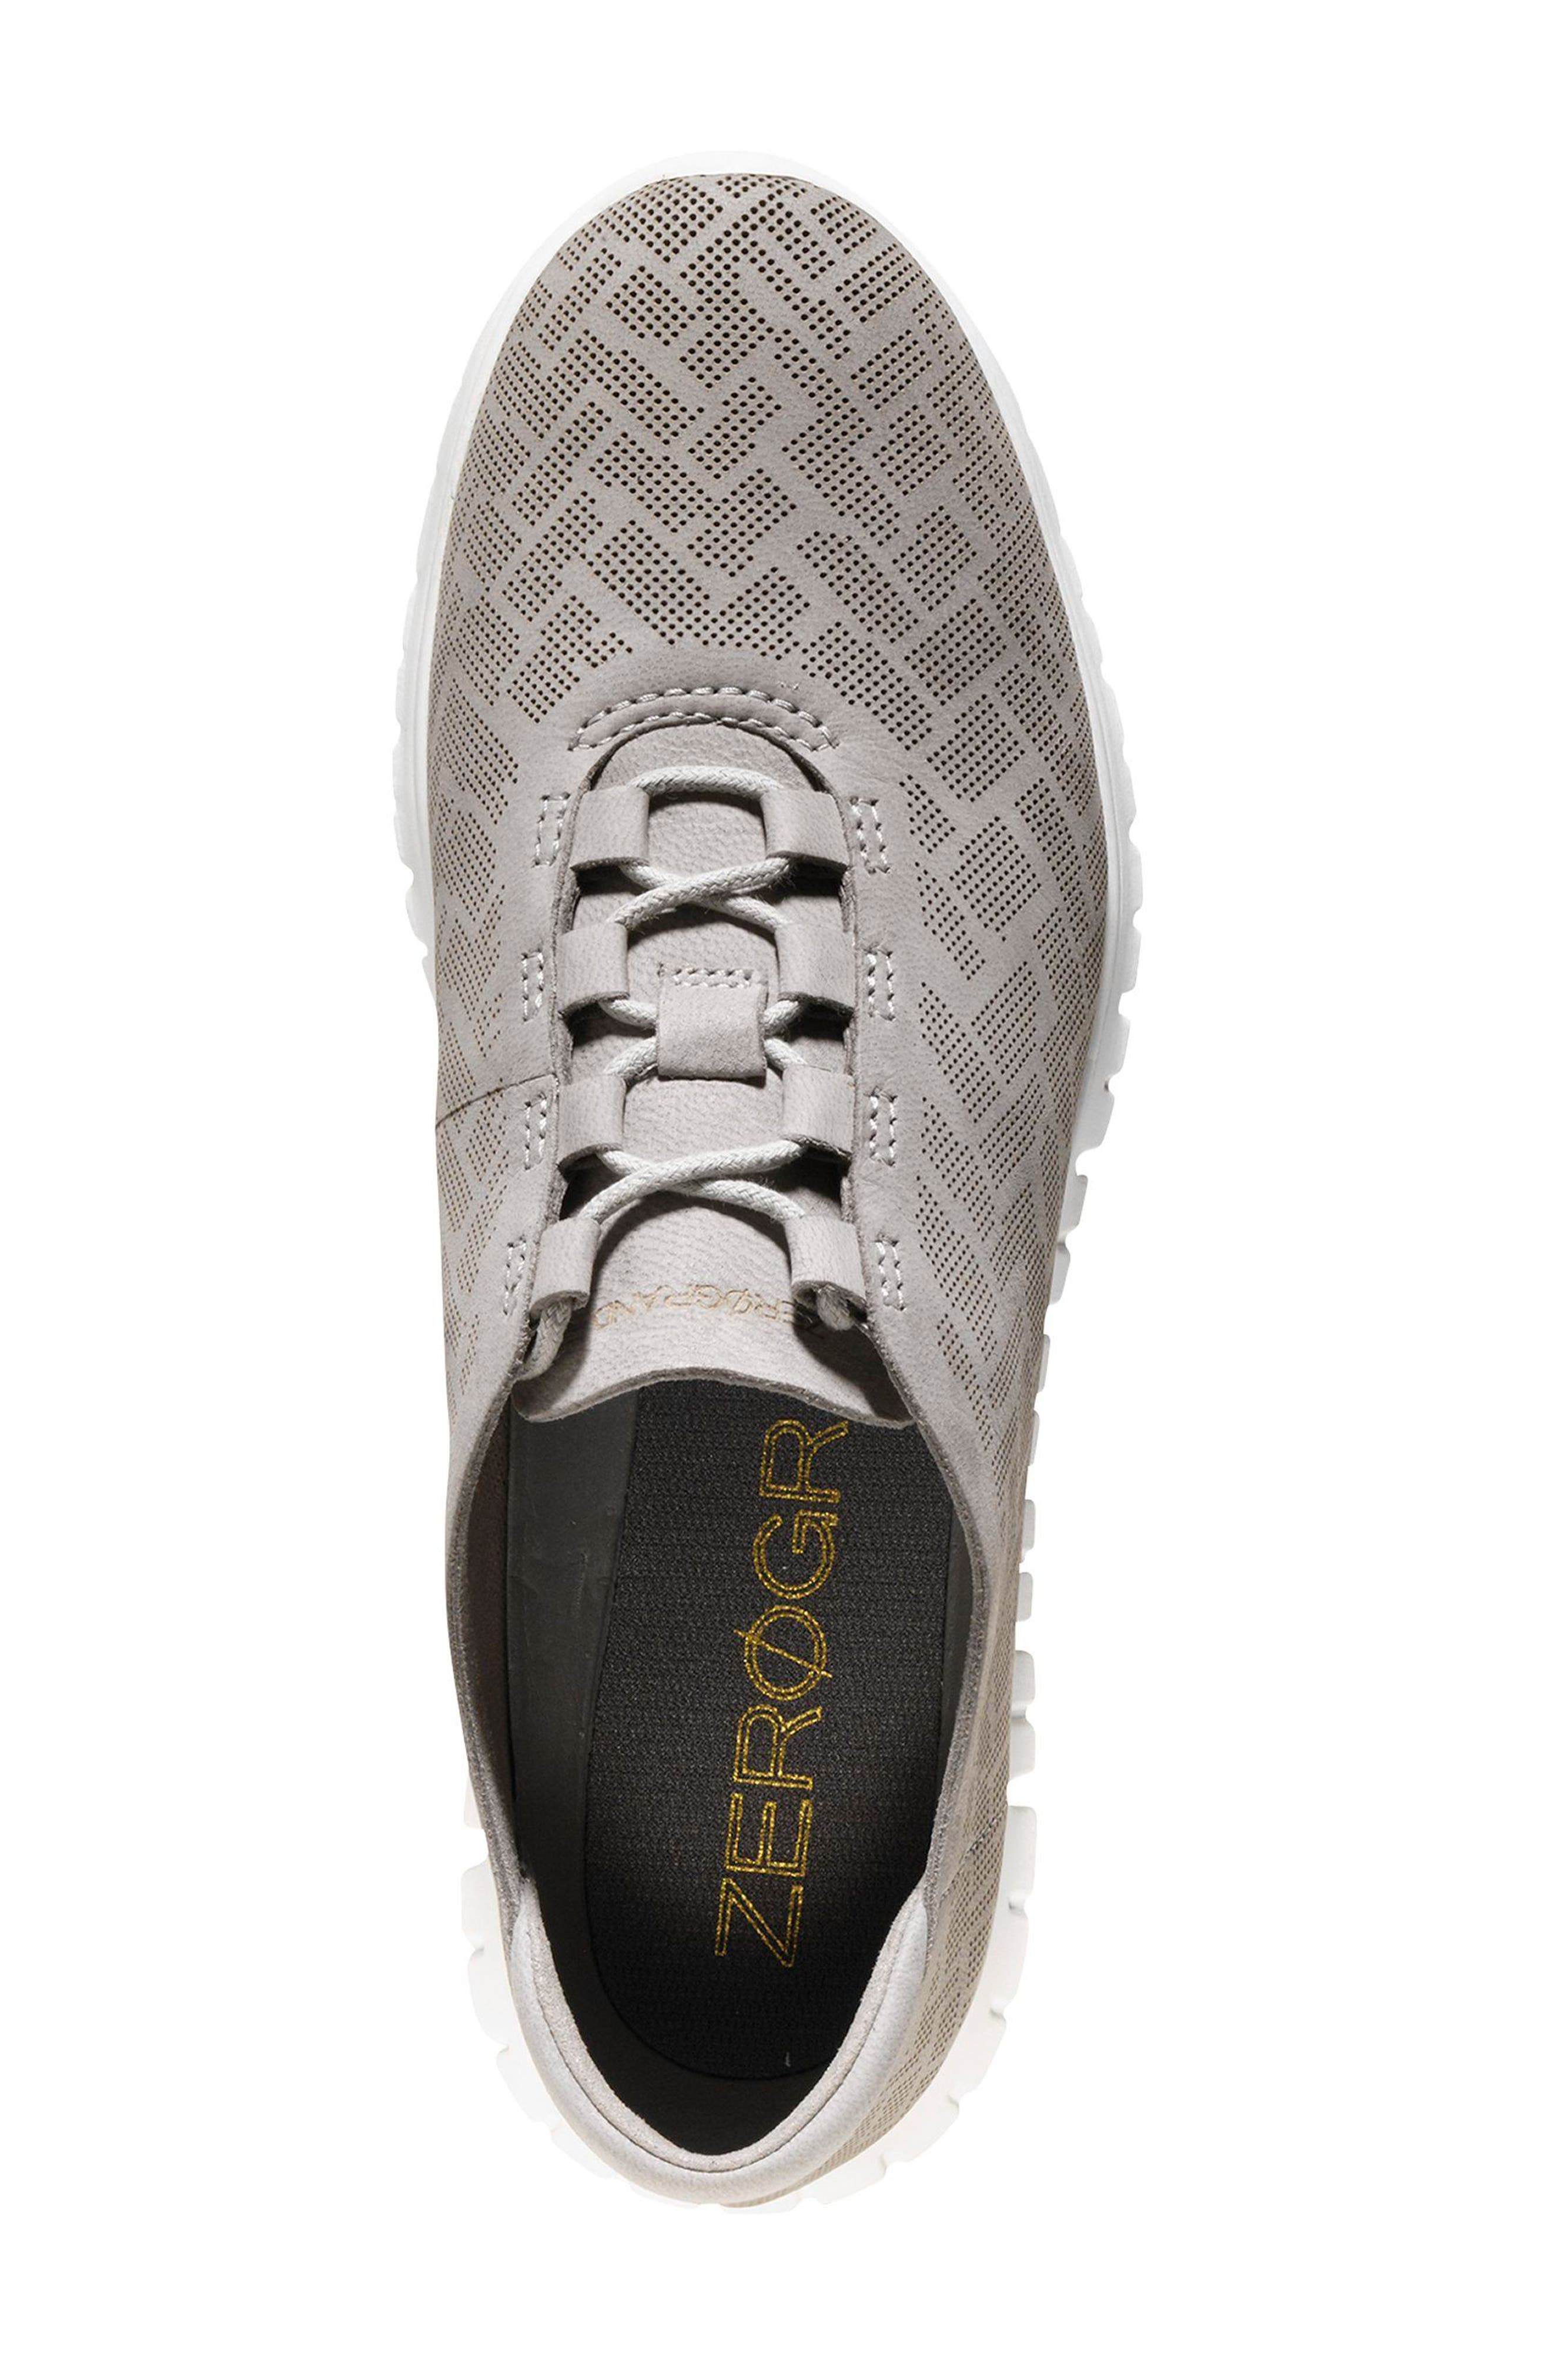 ZERØGRAND Genevieve Perforated Sneaker,                             Alternate thumbnail 4, color,                             Ironstone Perf Nubuck